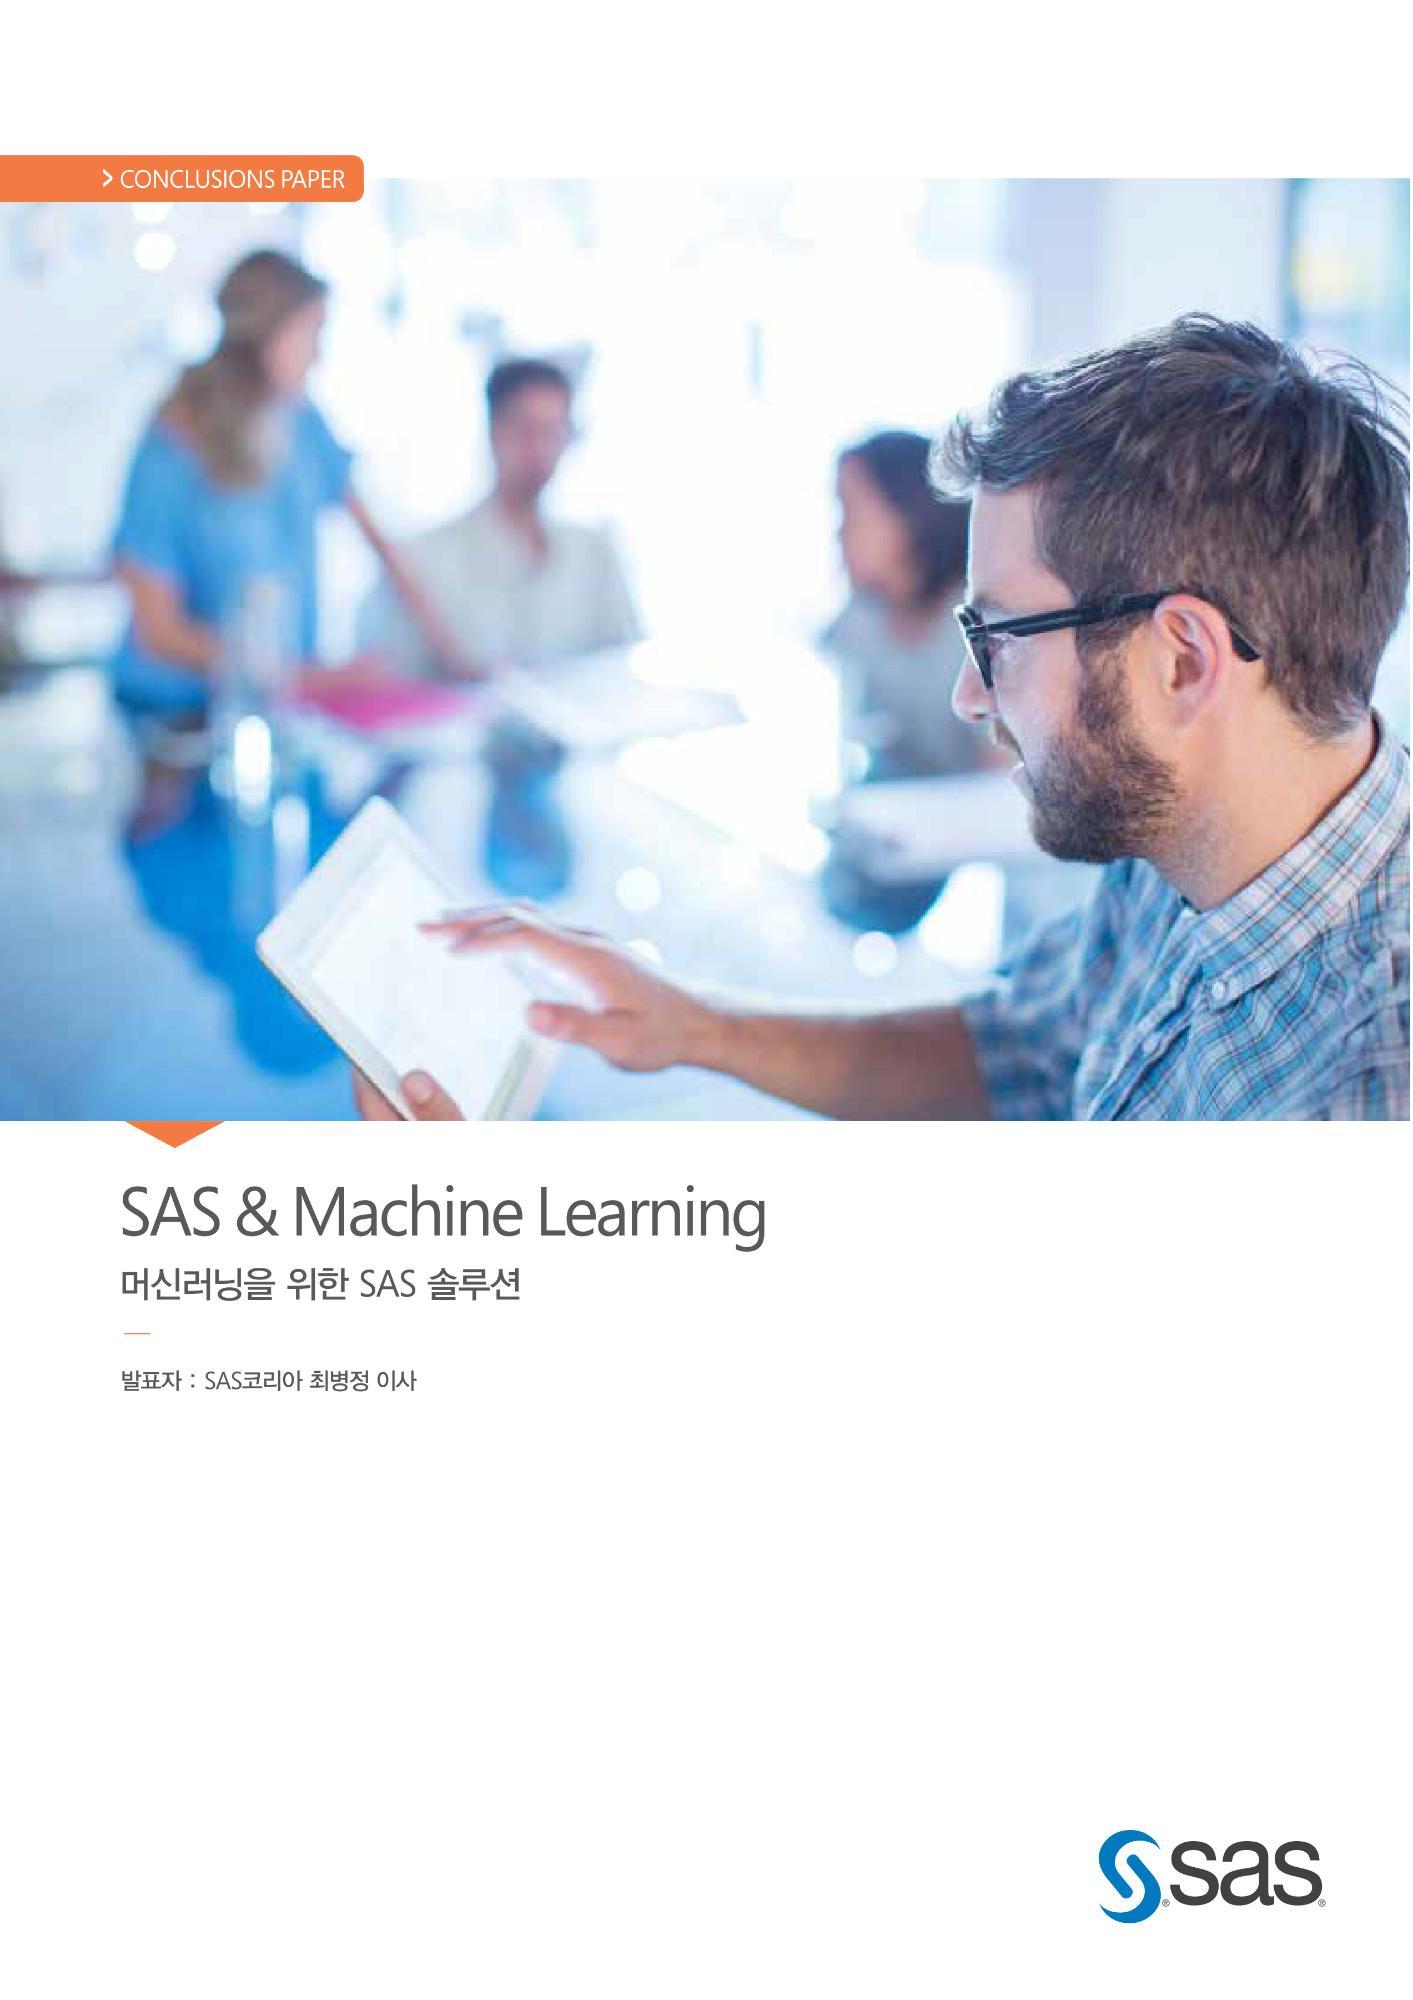 SAS & Machine Learning